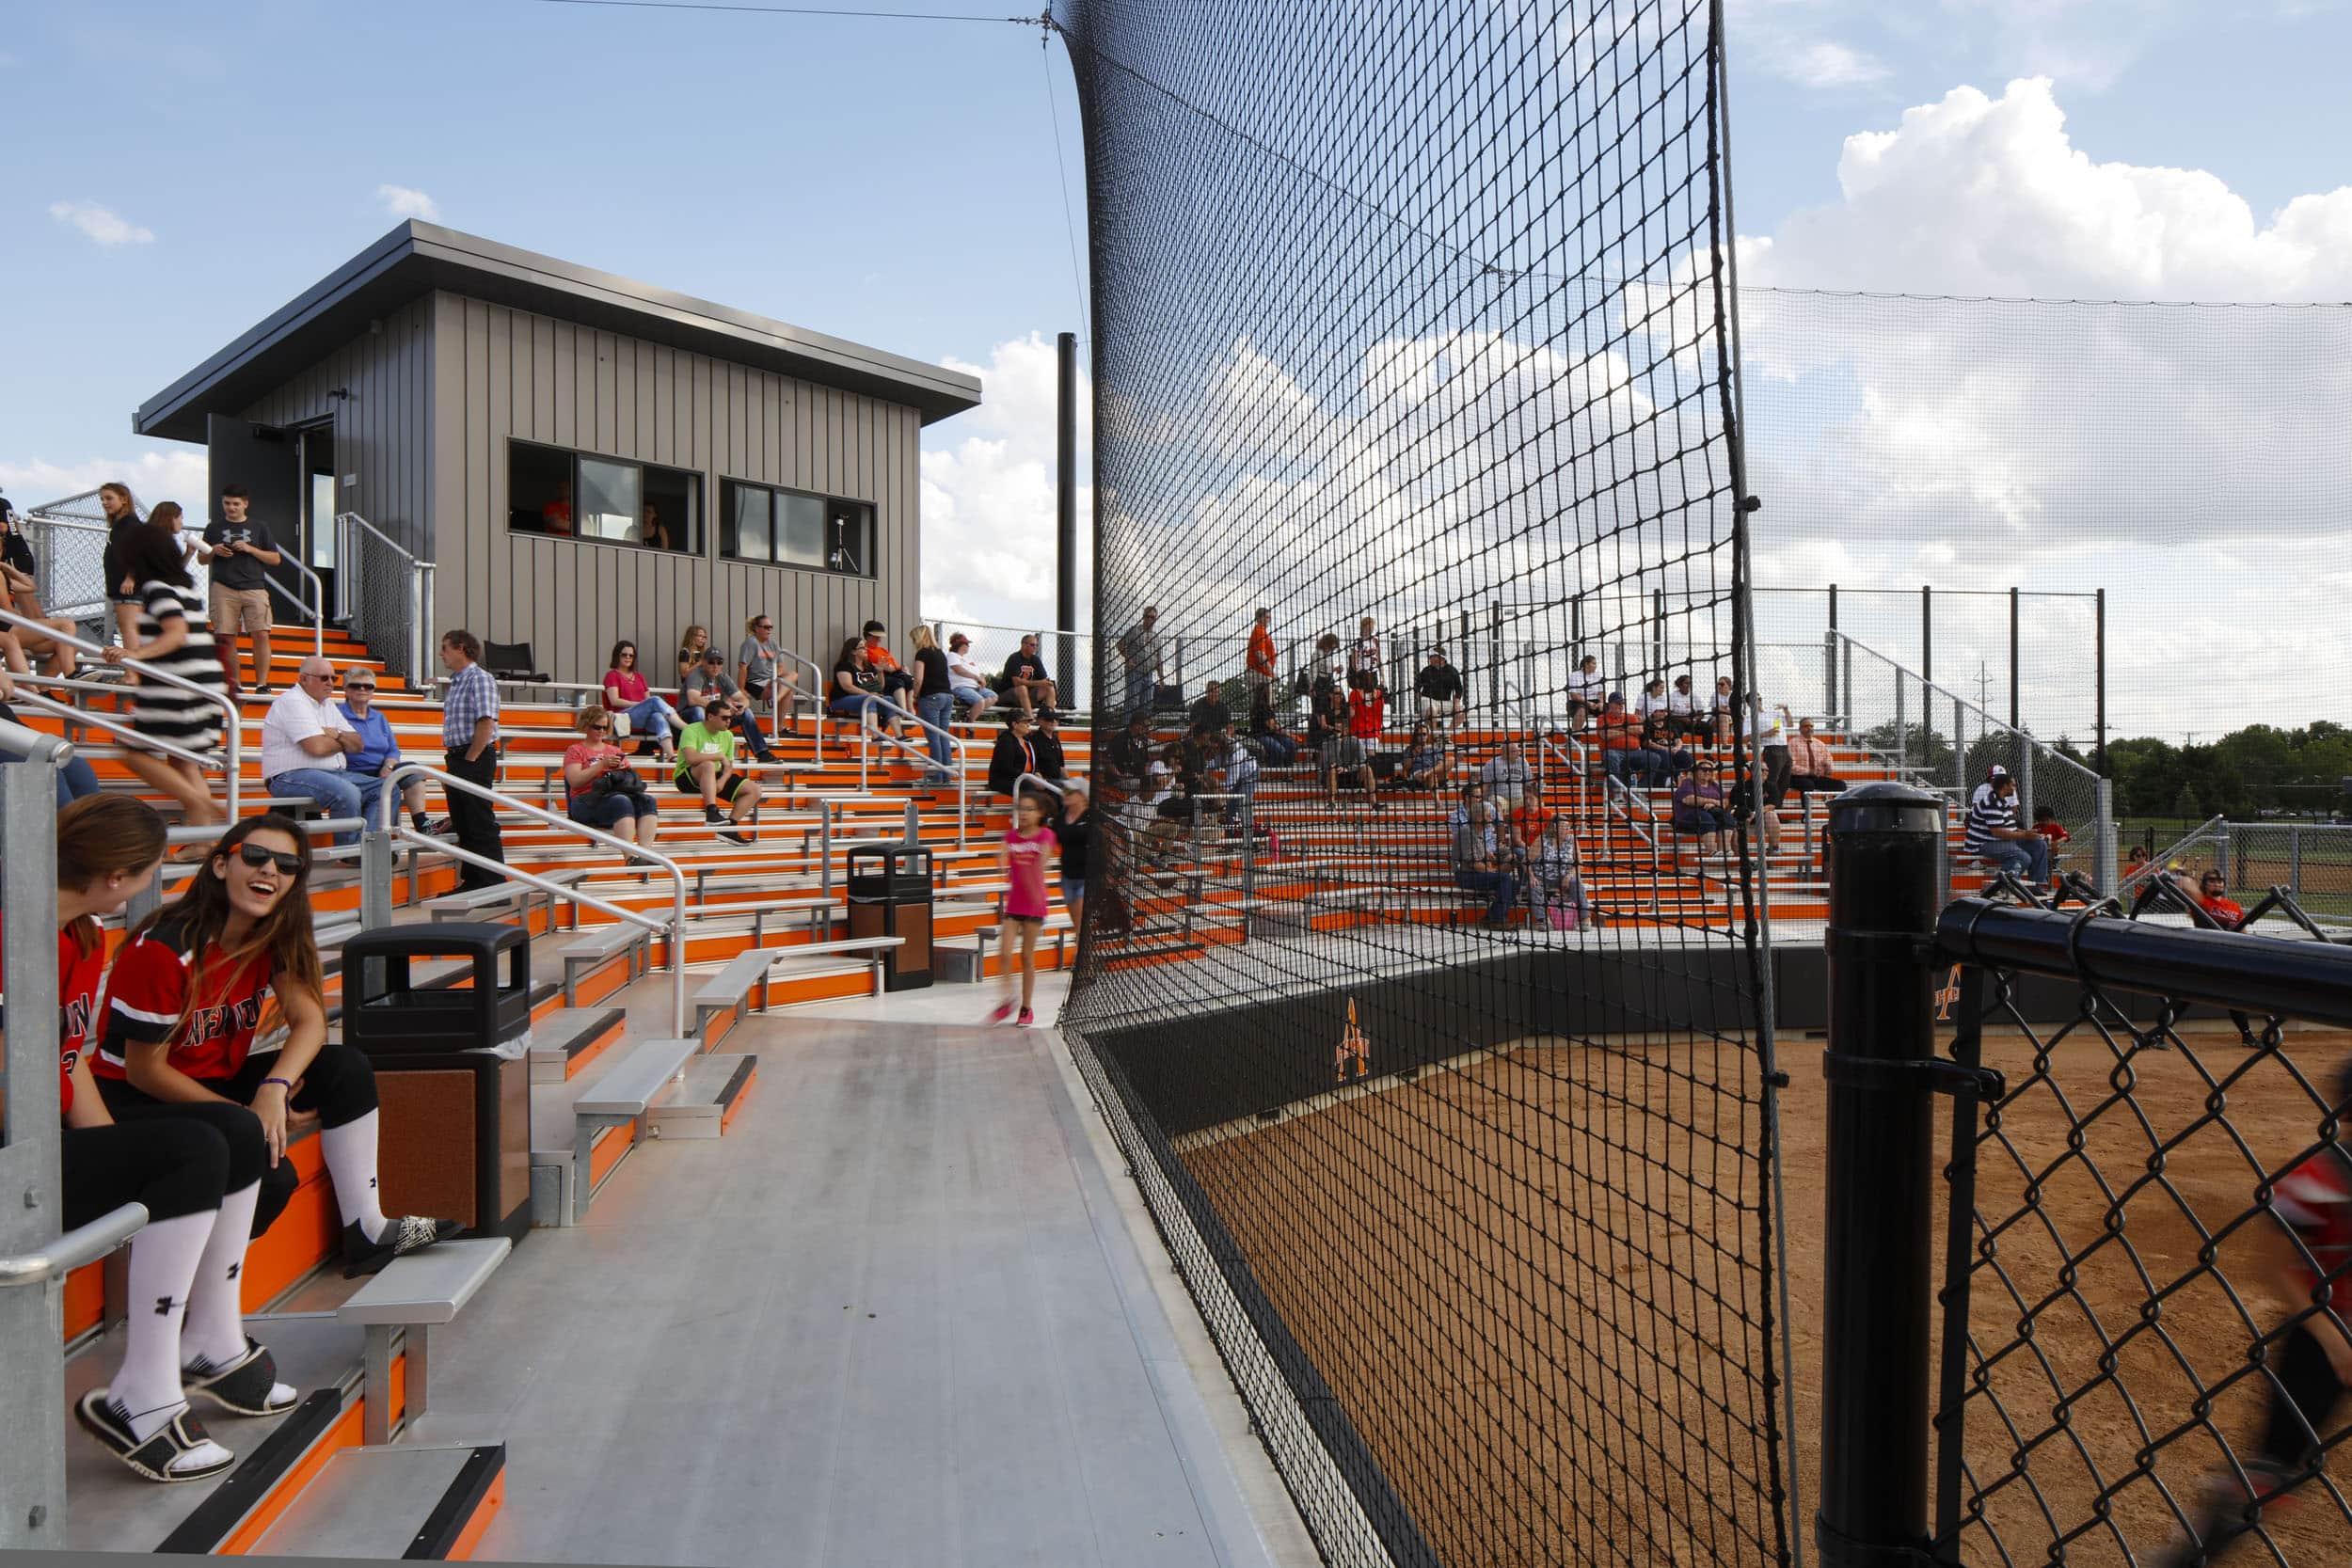 077-Ames-Baseball-Softball-Complex